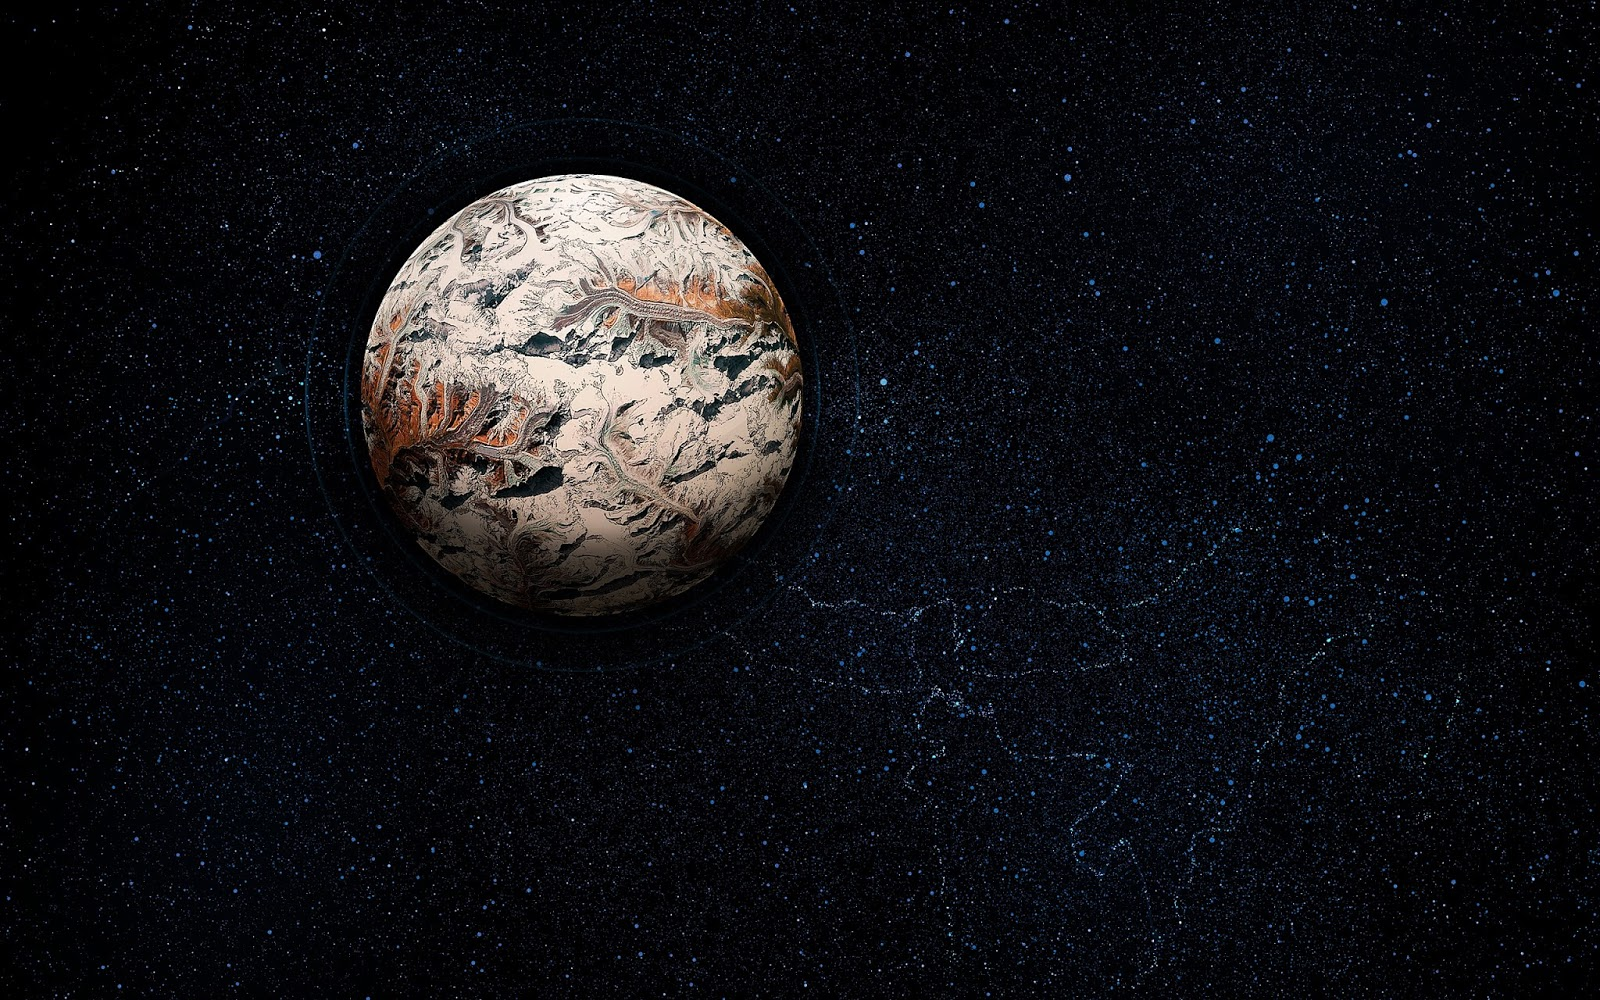 earth planet hd - photo #36